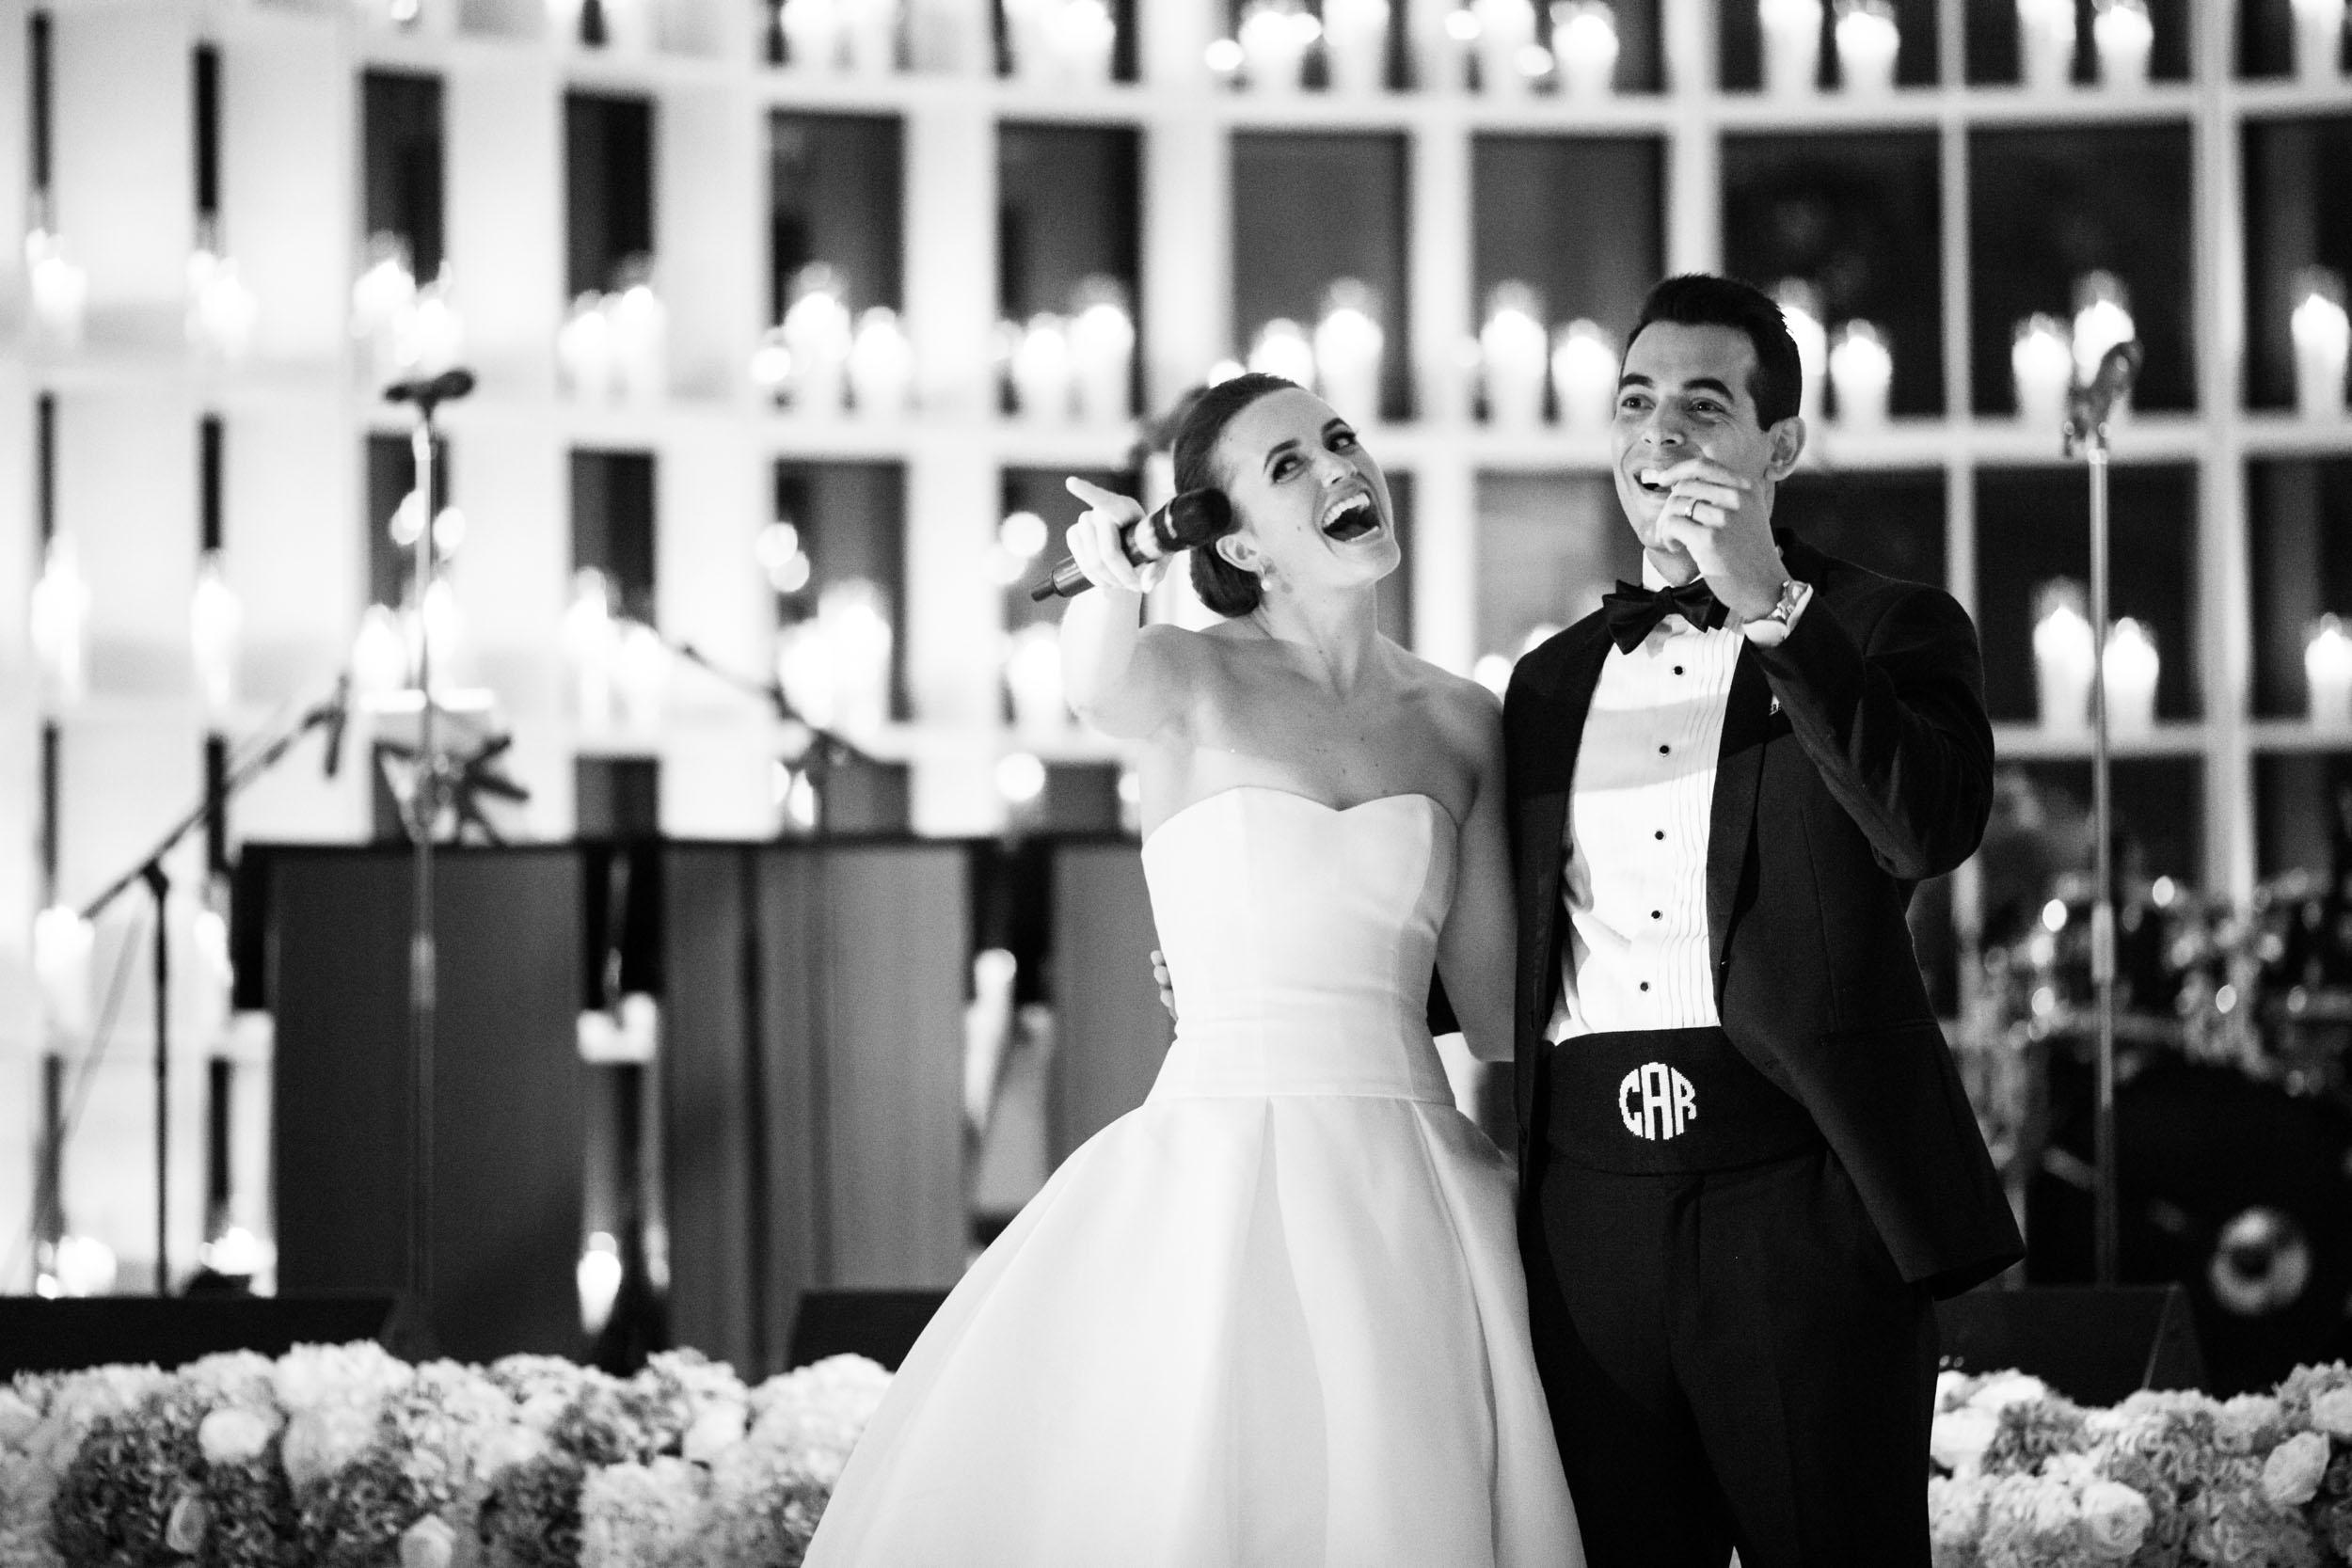 Documentary photo of a bride and groom at their Kiawah Island, South Carolina wedding.